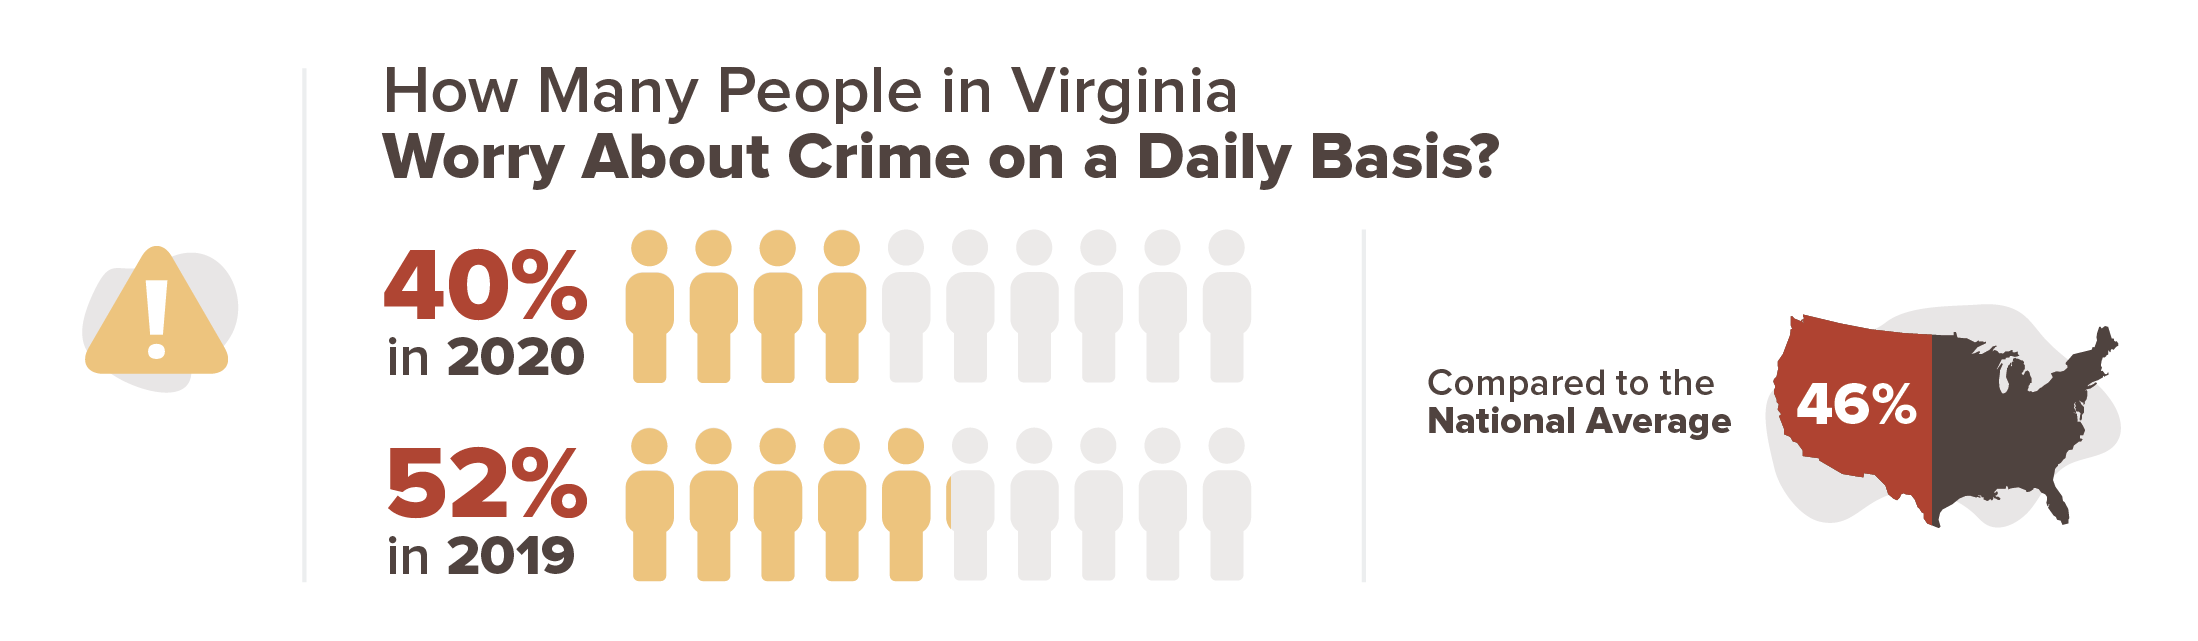 Virginia crime concern infographic